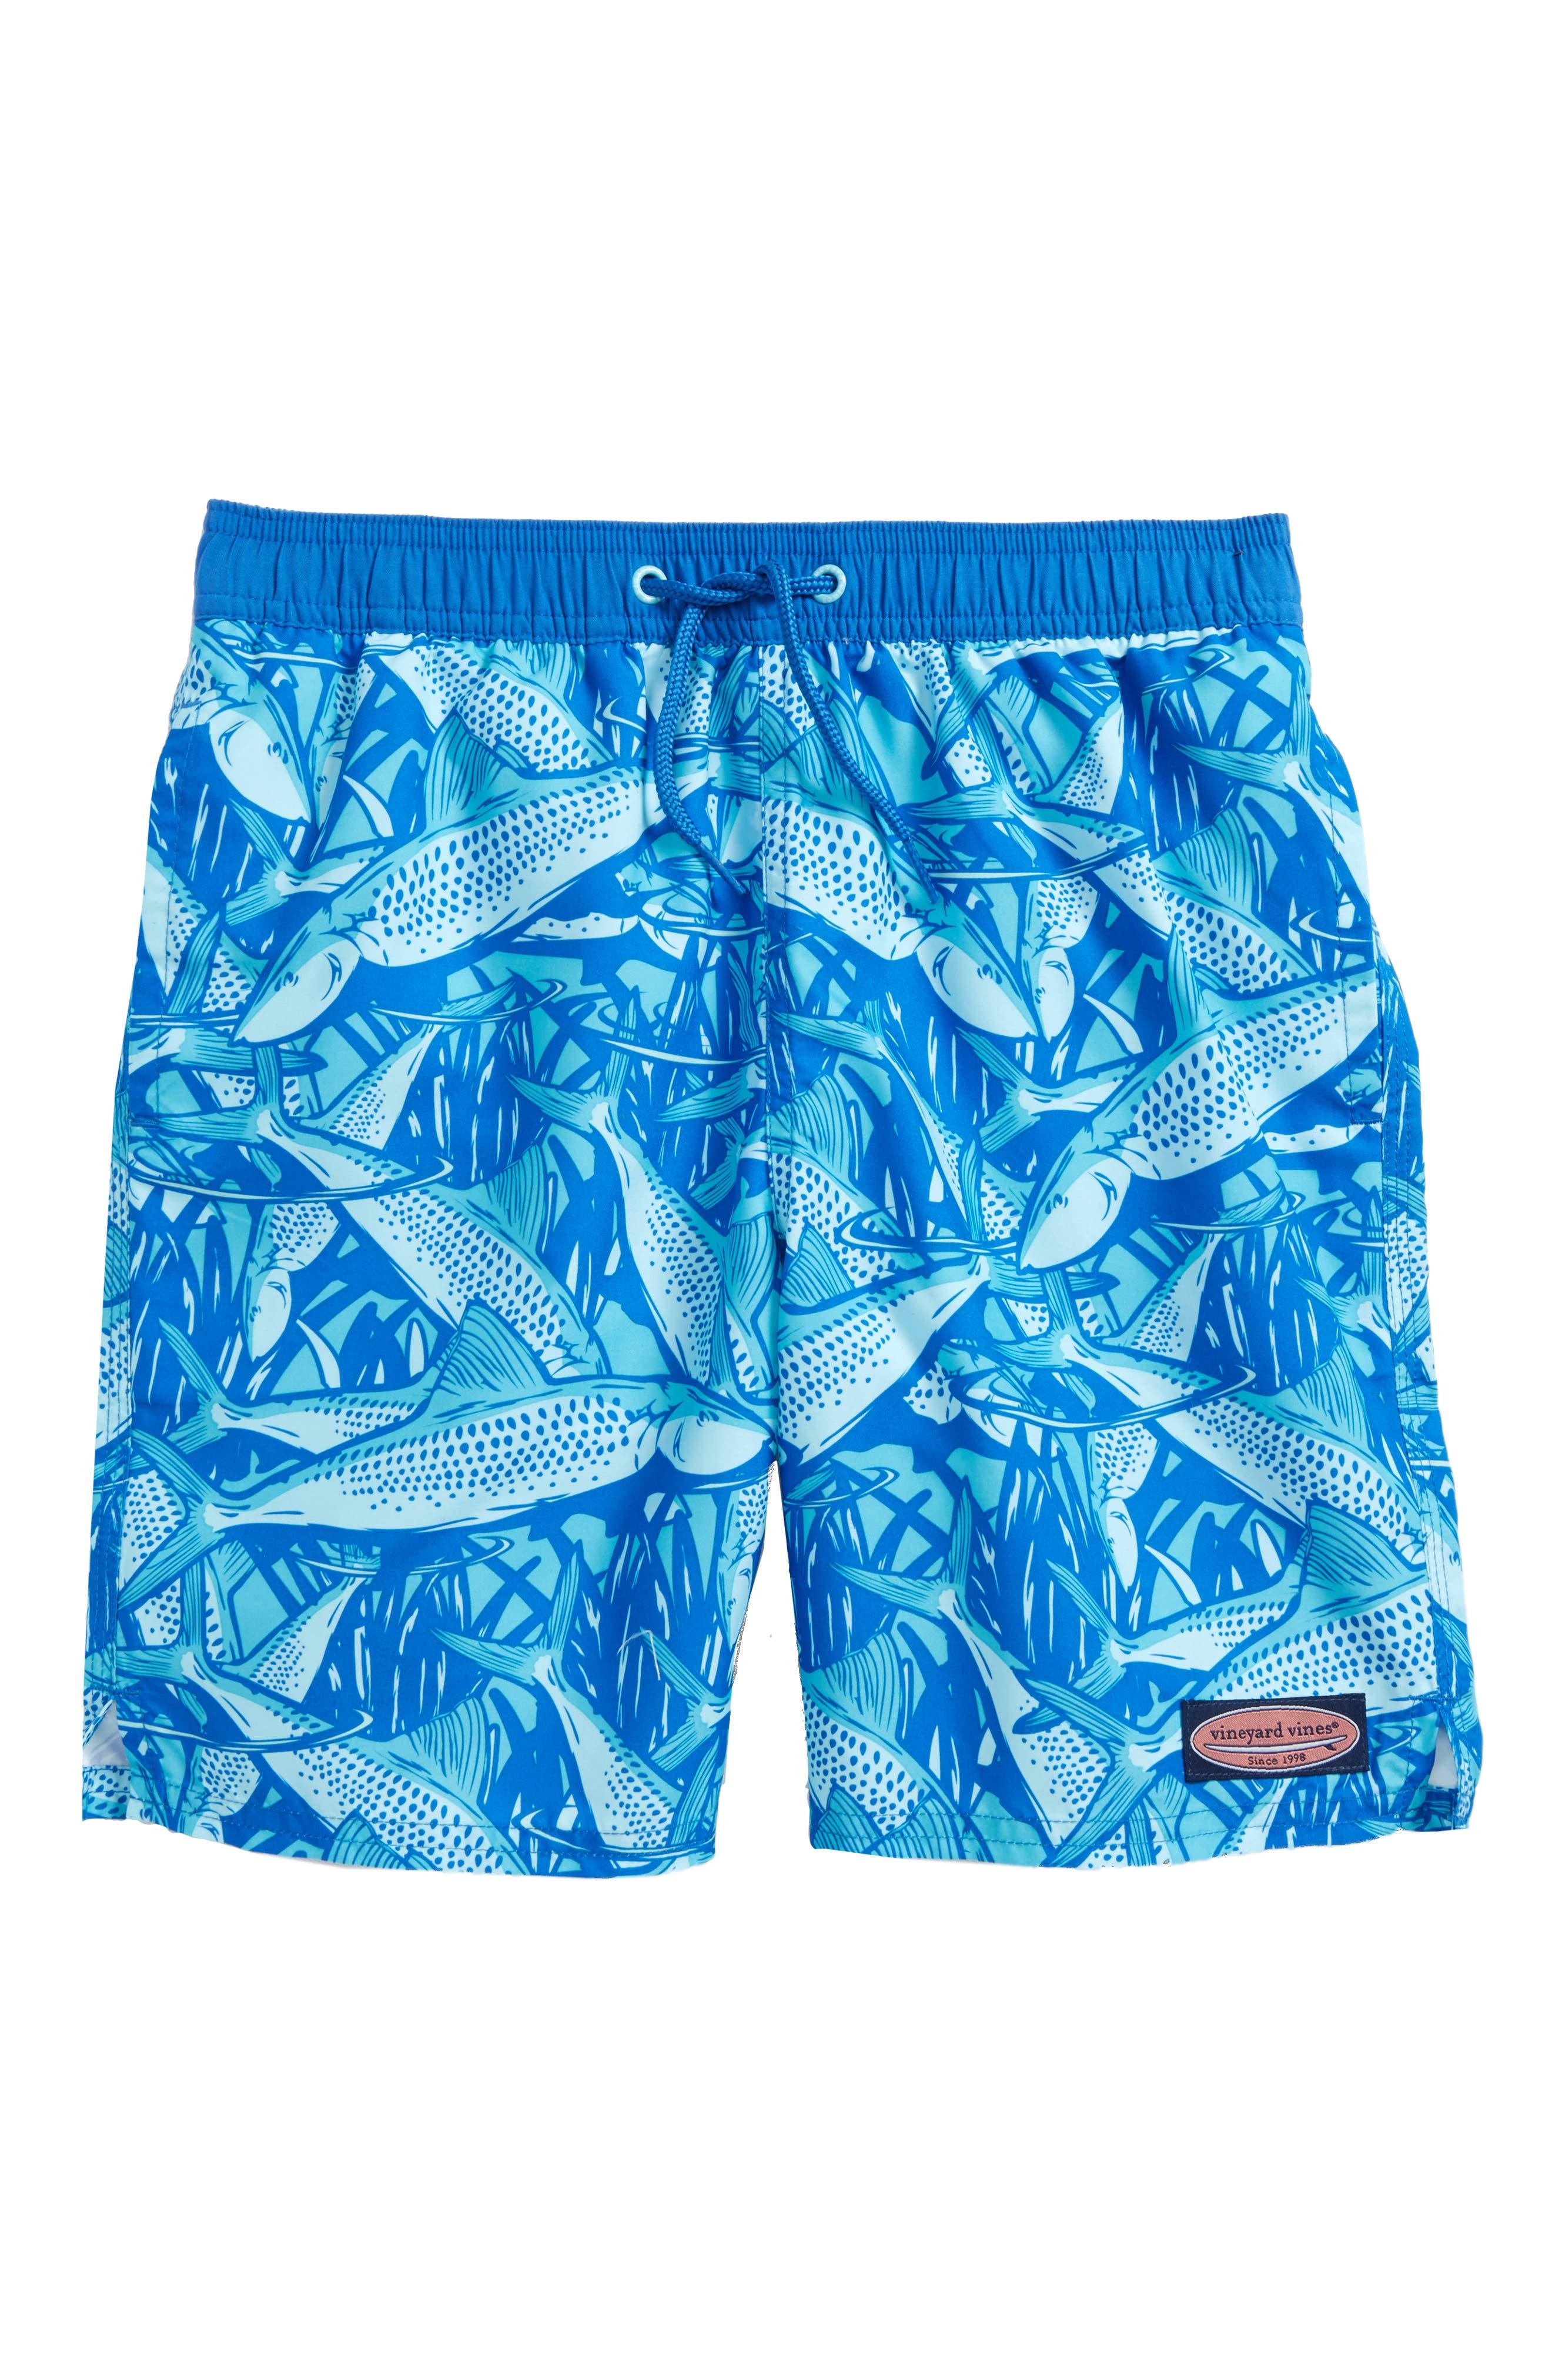 Chappy Bonefish Swim Trunks,                             Main thumbnail 1, color,                             440